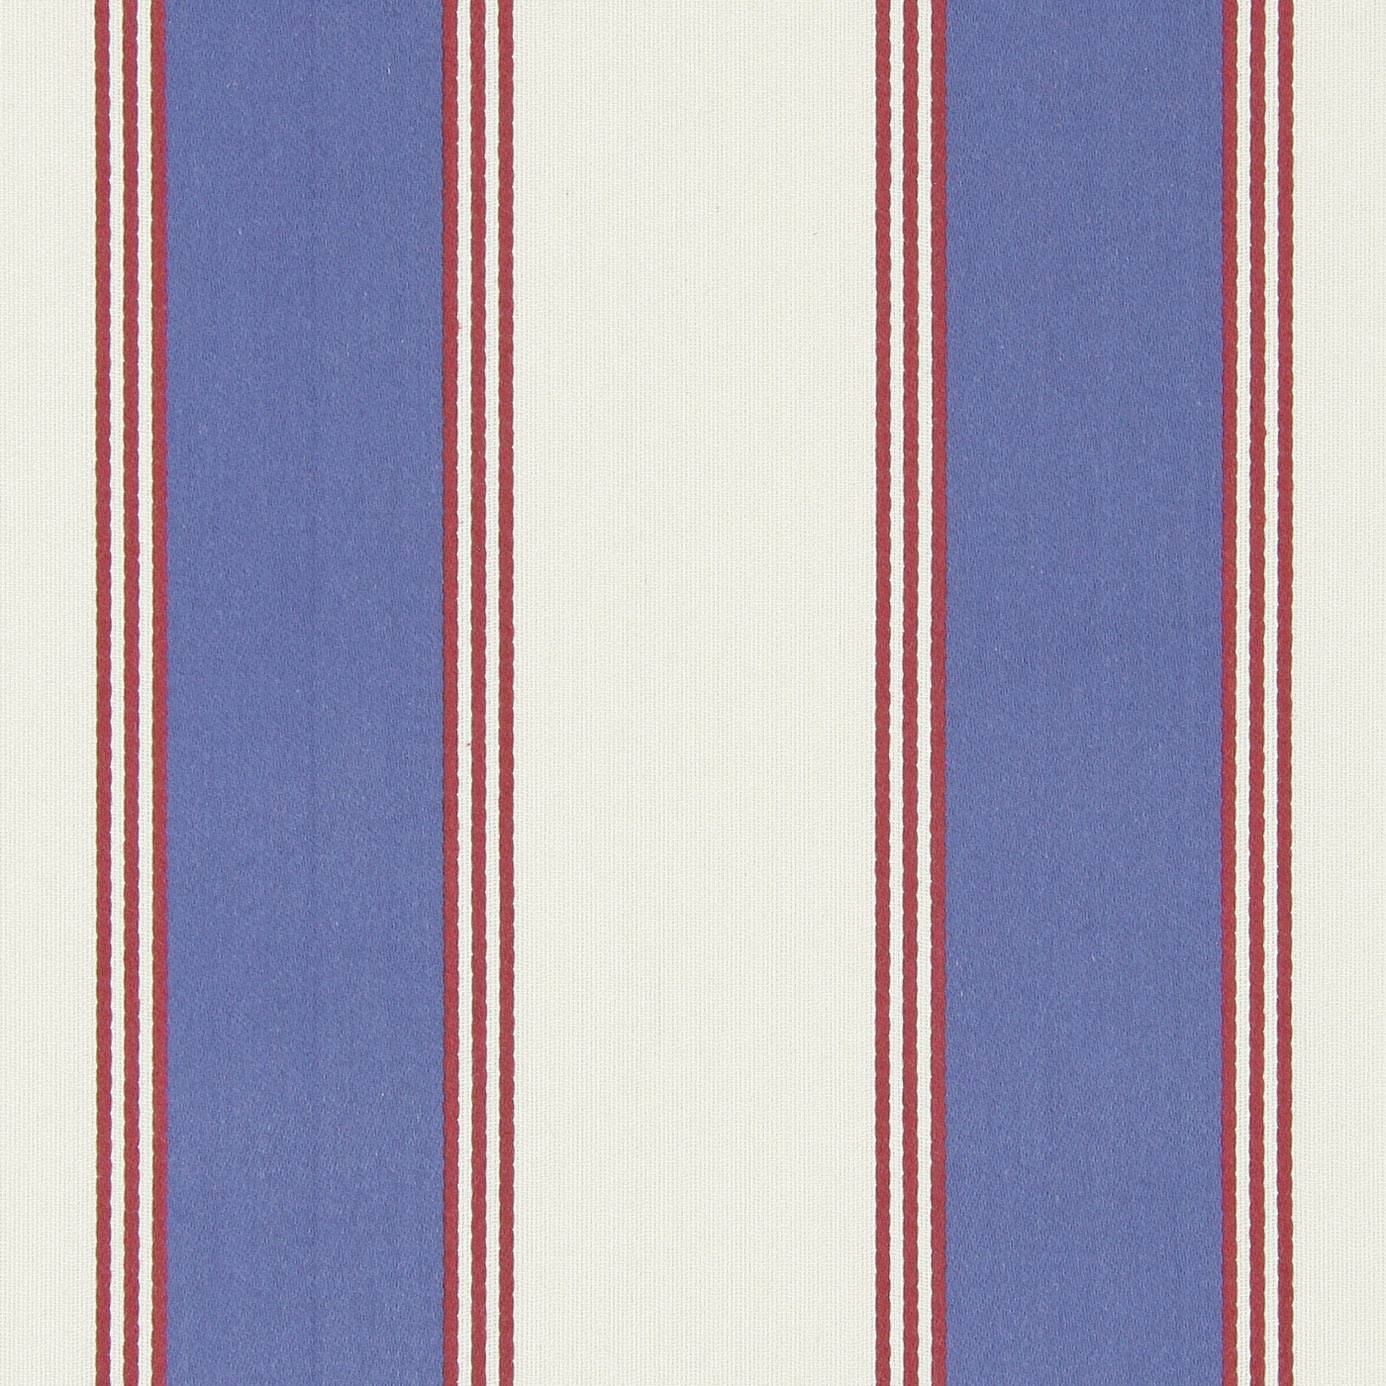 Stowe Fabric - Nautical (1325/596) - Prestigious Textiles Brighton Fabrics Collection